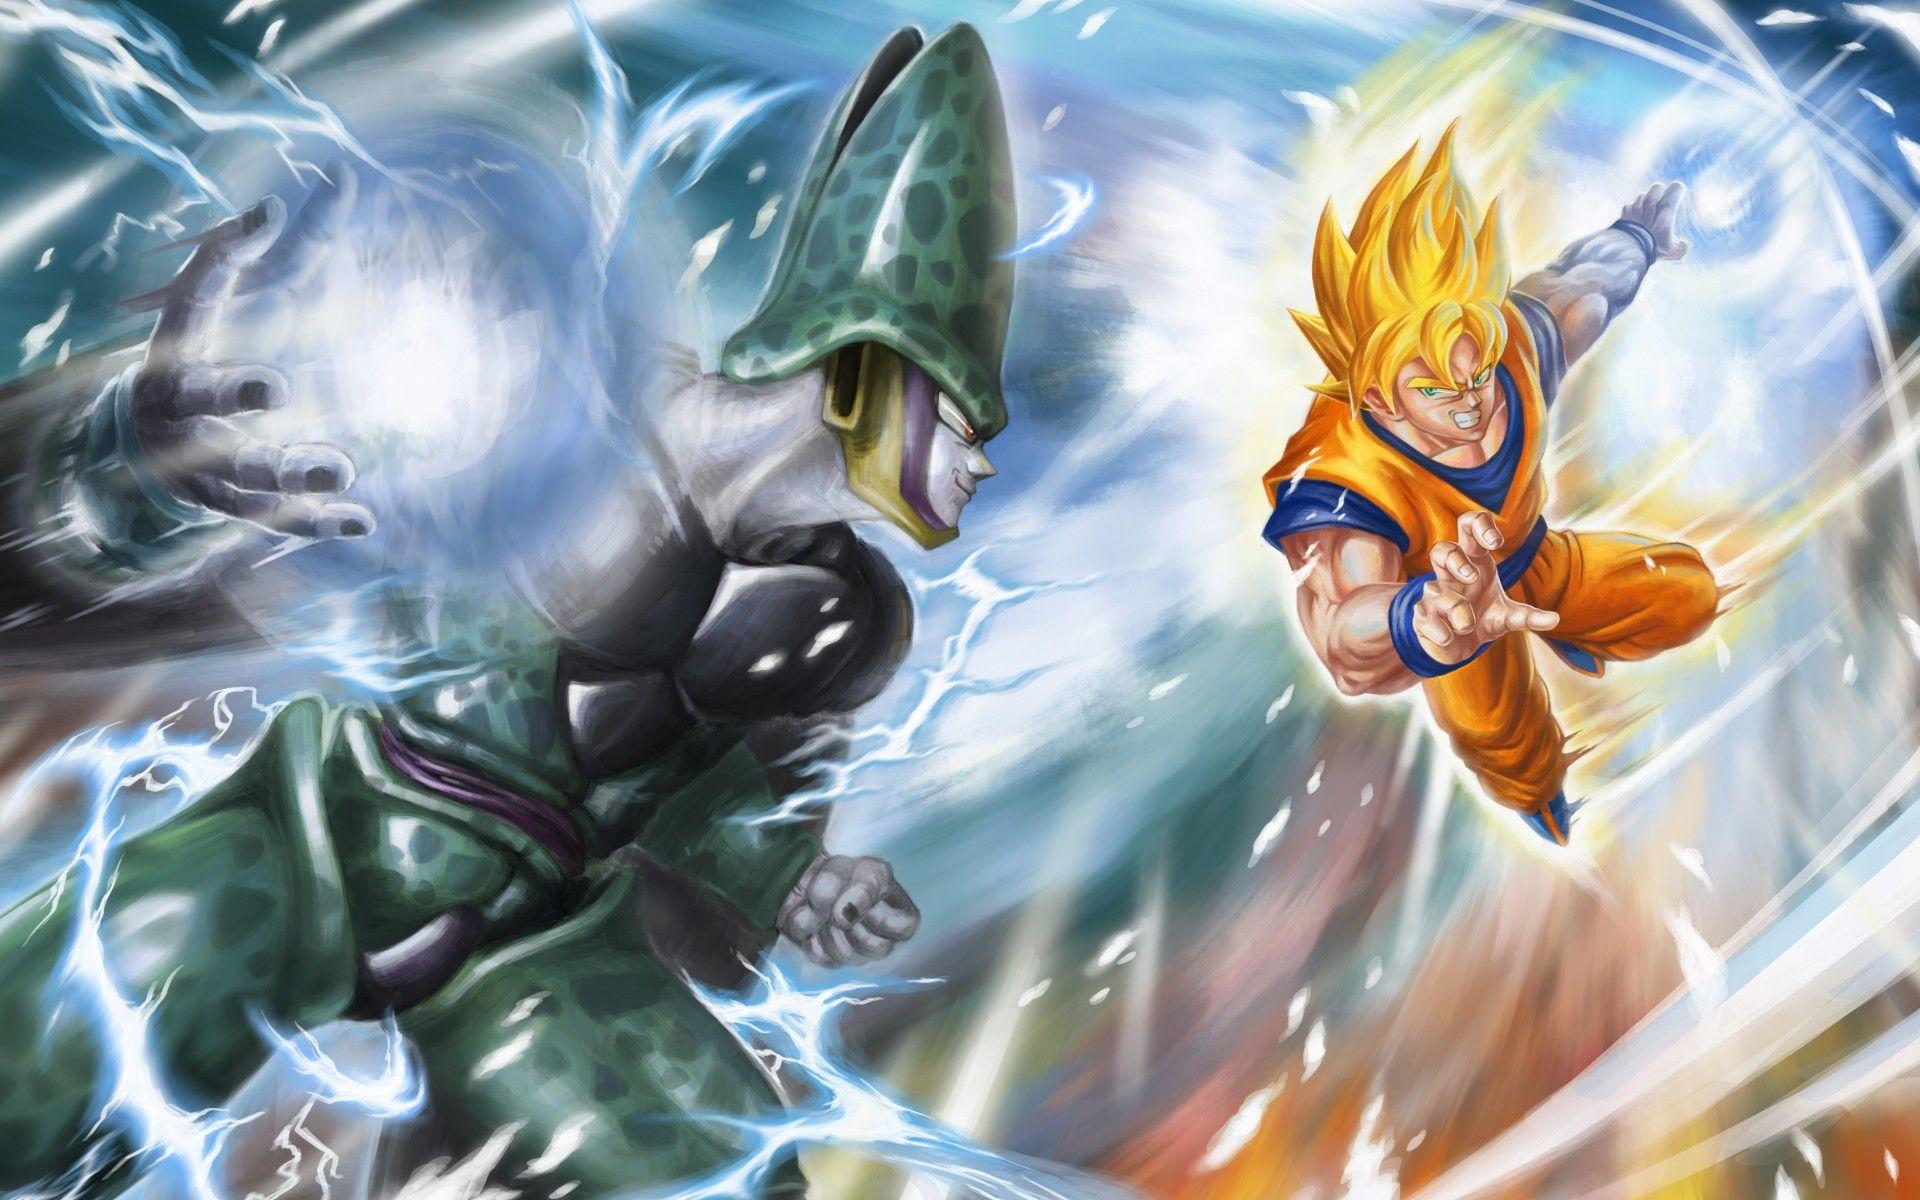 Google chrome themes dragon ball z - Dragon Ball Z Goku Super Saiyan Vs Cell Perfect Form Wallpaper